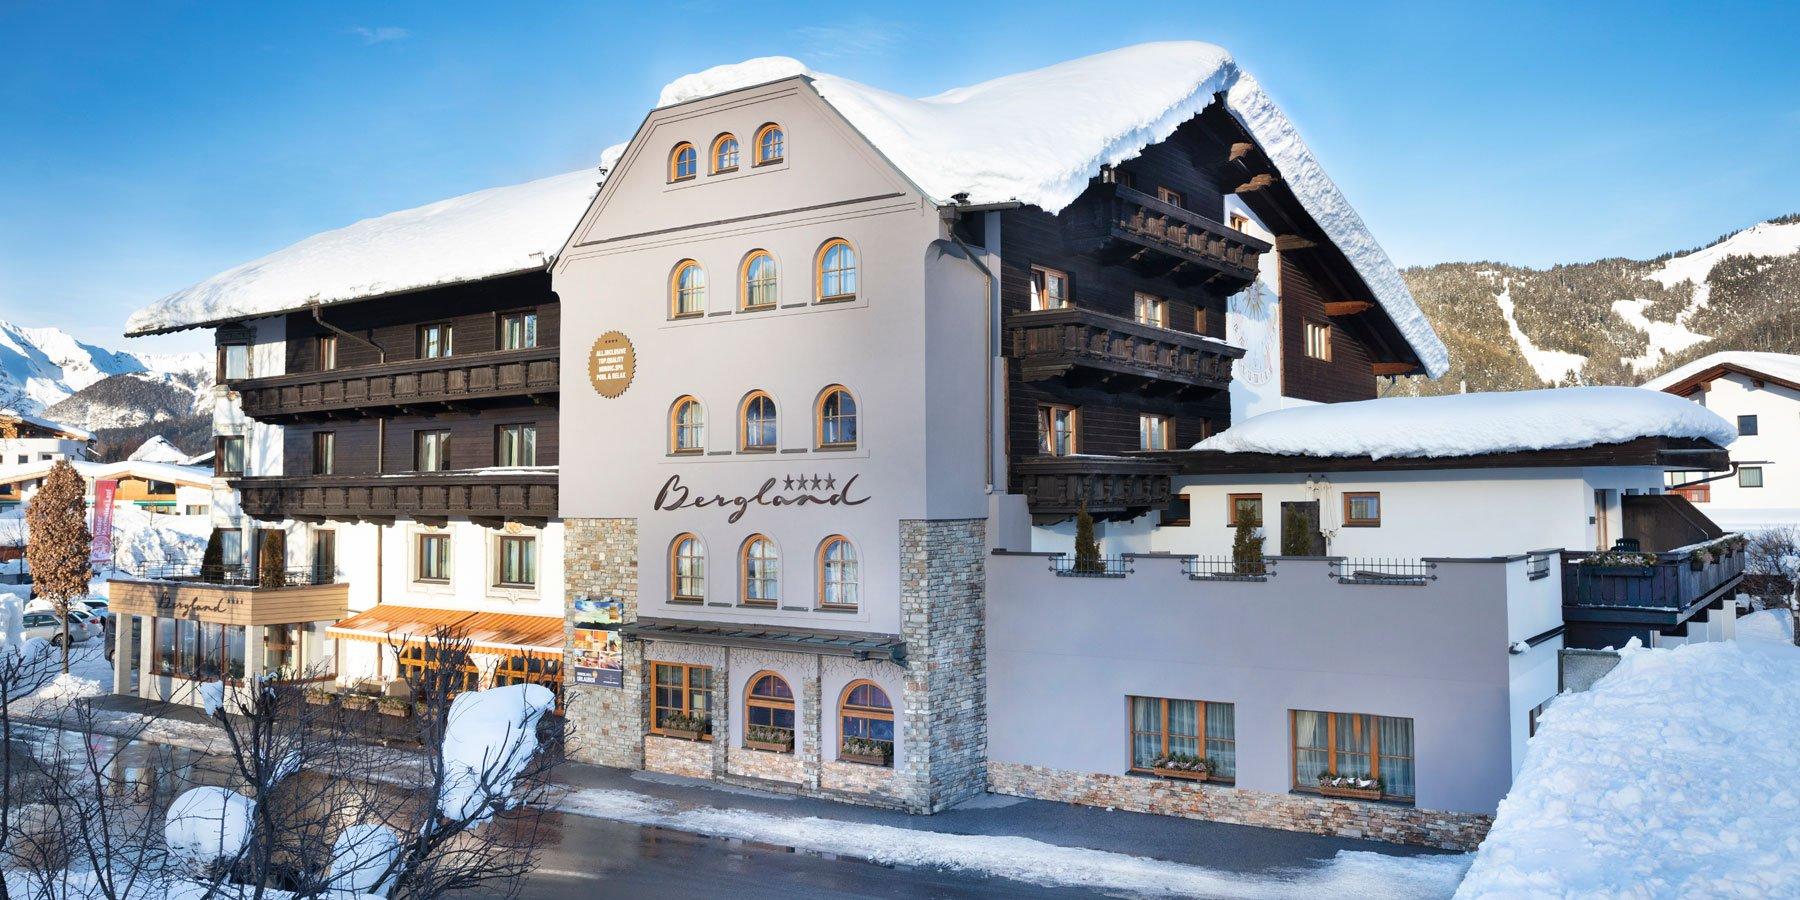 Hotel Bergland Seefeld im Winter